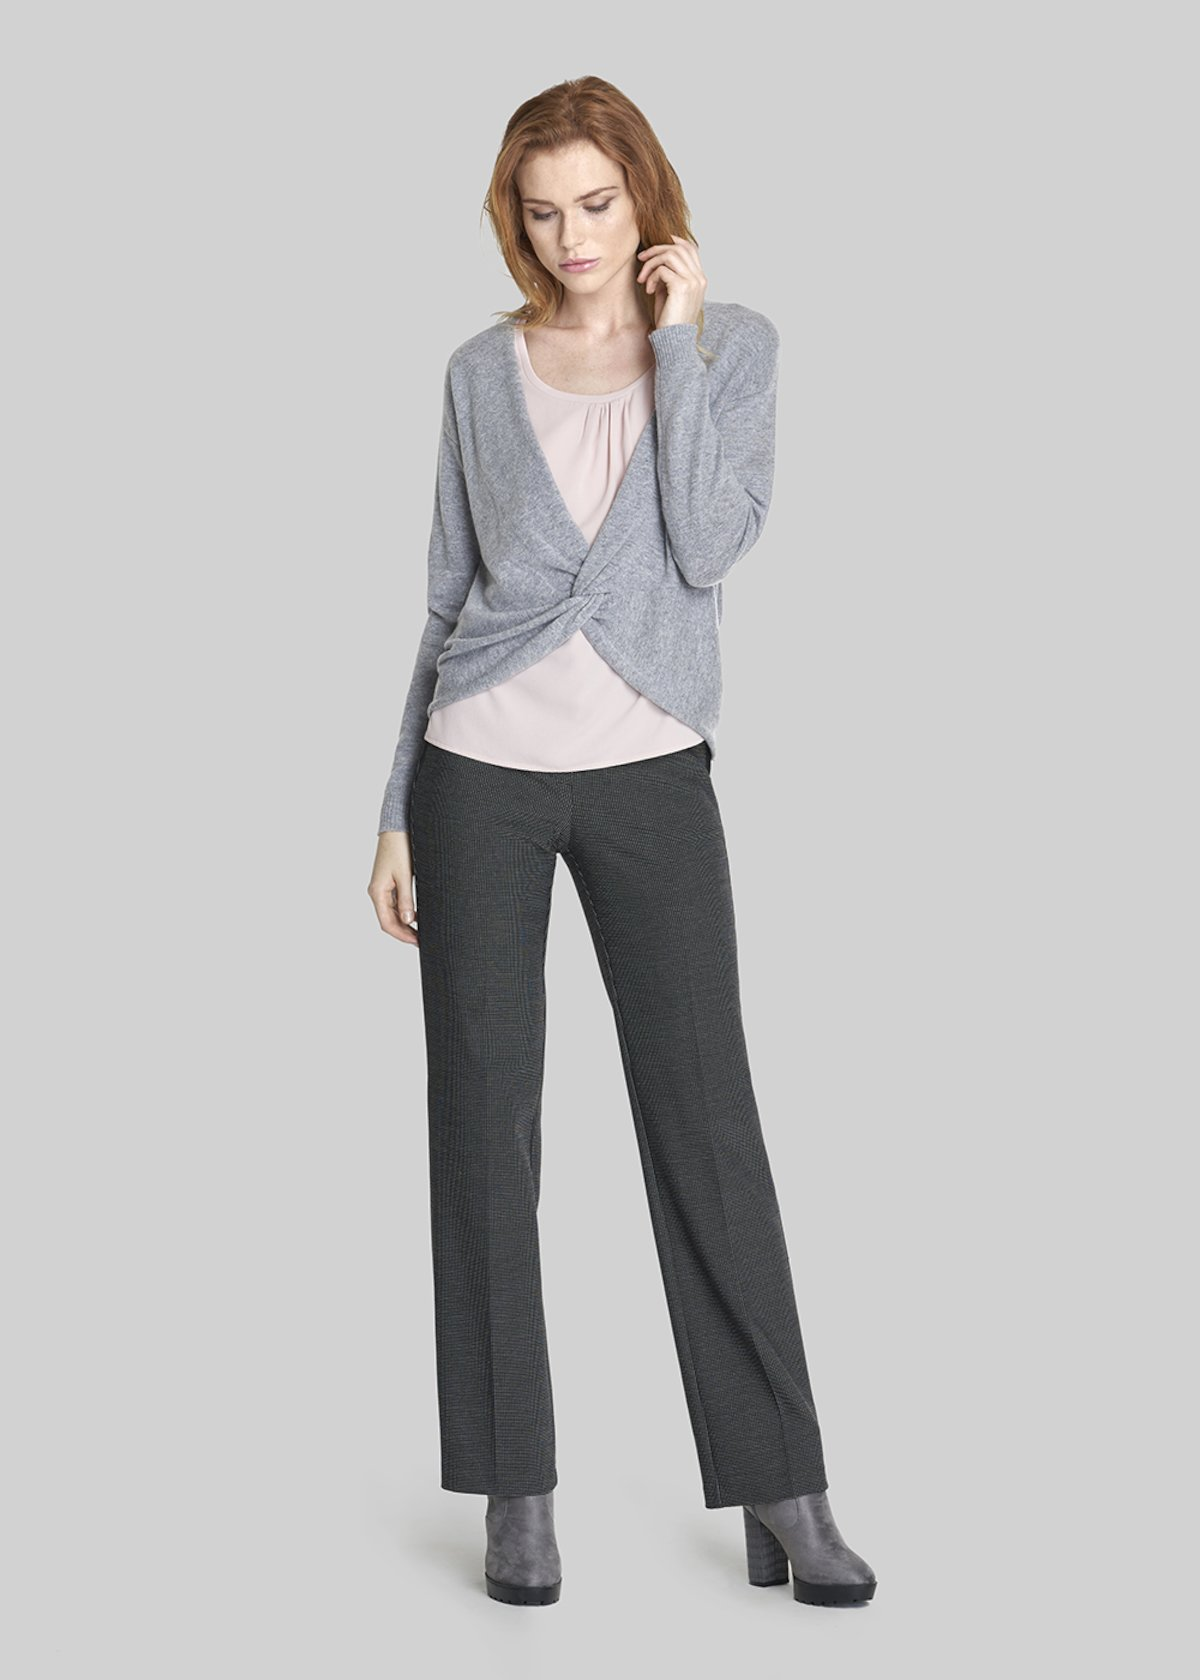 Celest knit shrug with knot detail - Medium Grey Melange